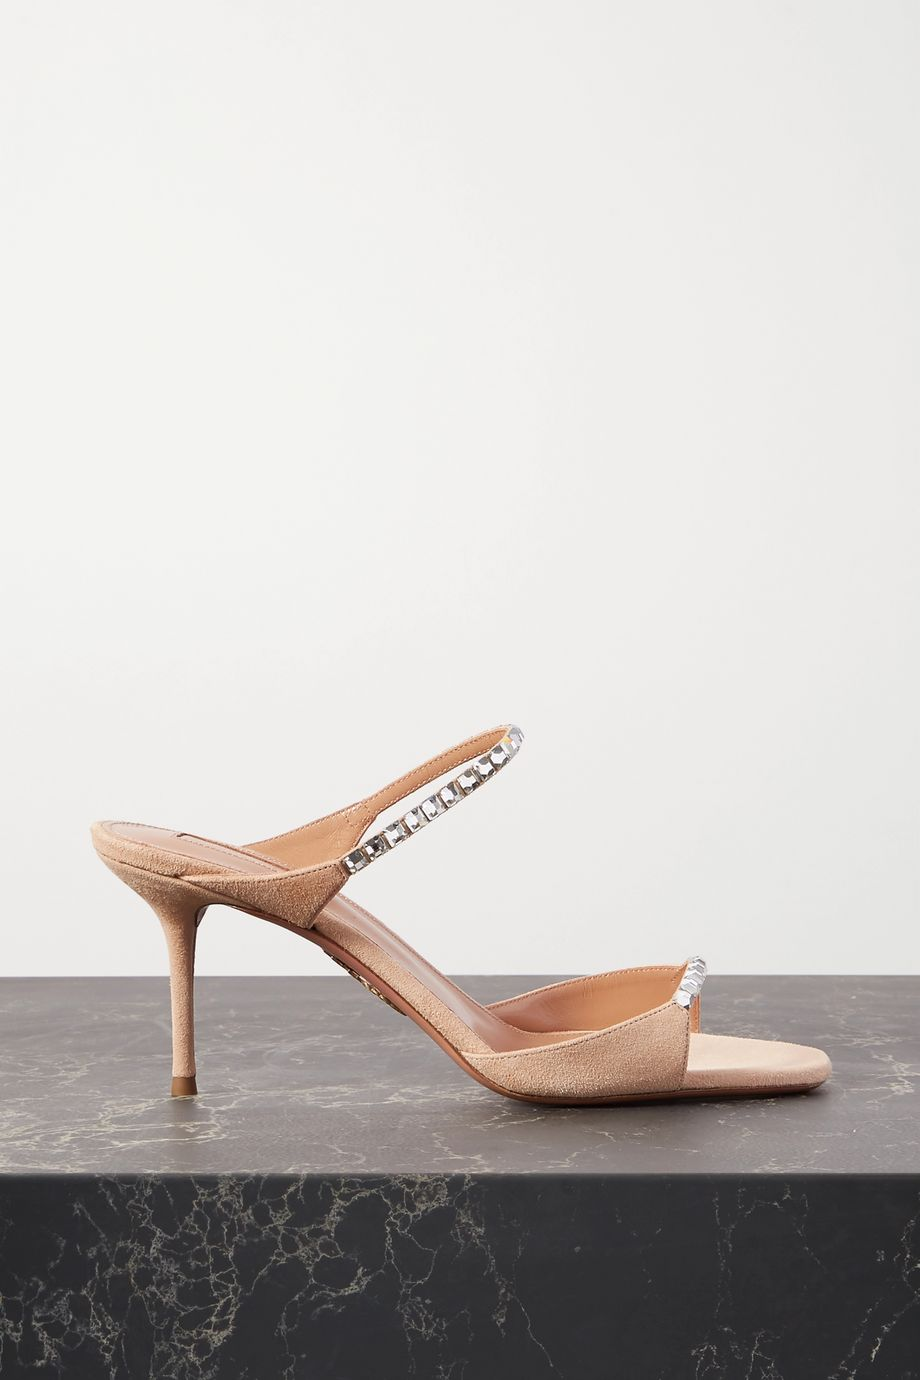 Aquazzura Diamante 75 crystal-embellished suede sandals